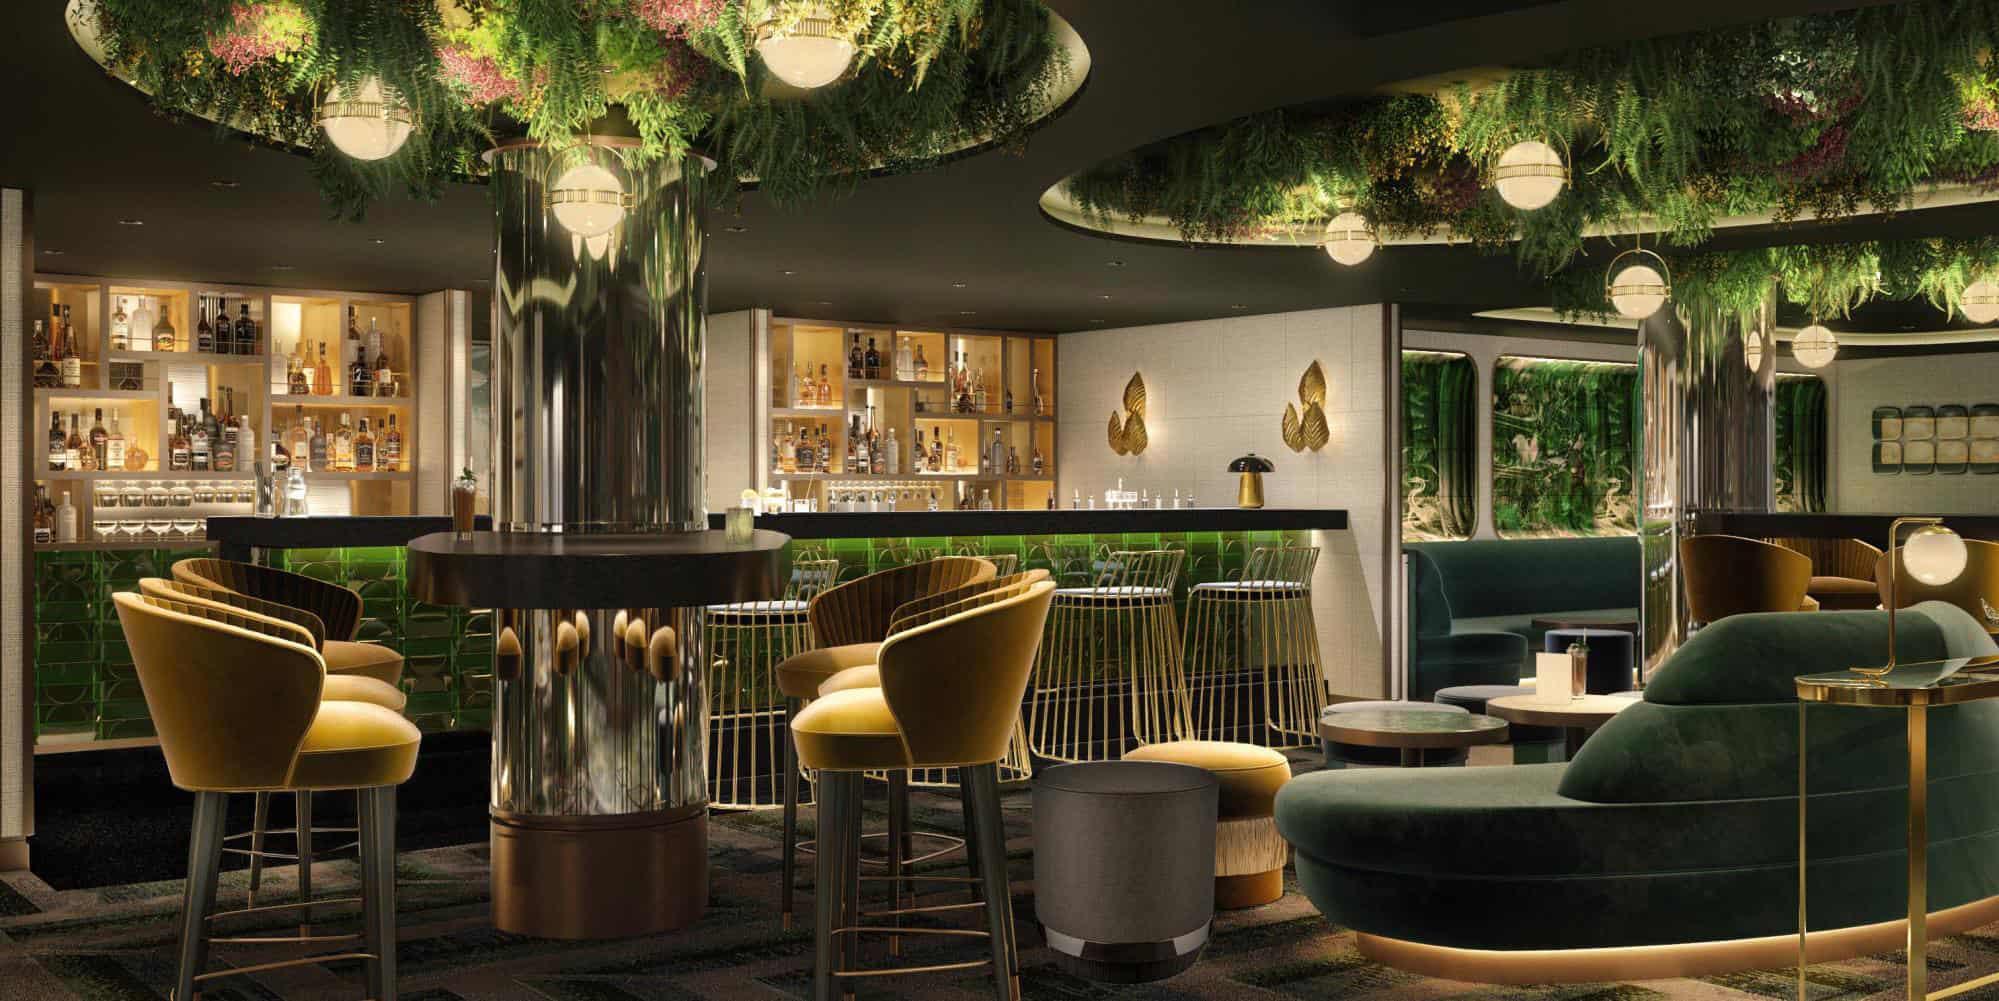 msc seashore chef's court cocktail bar